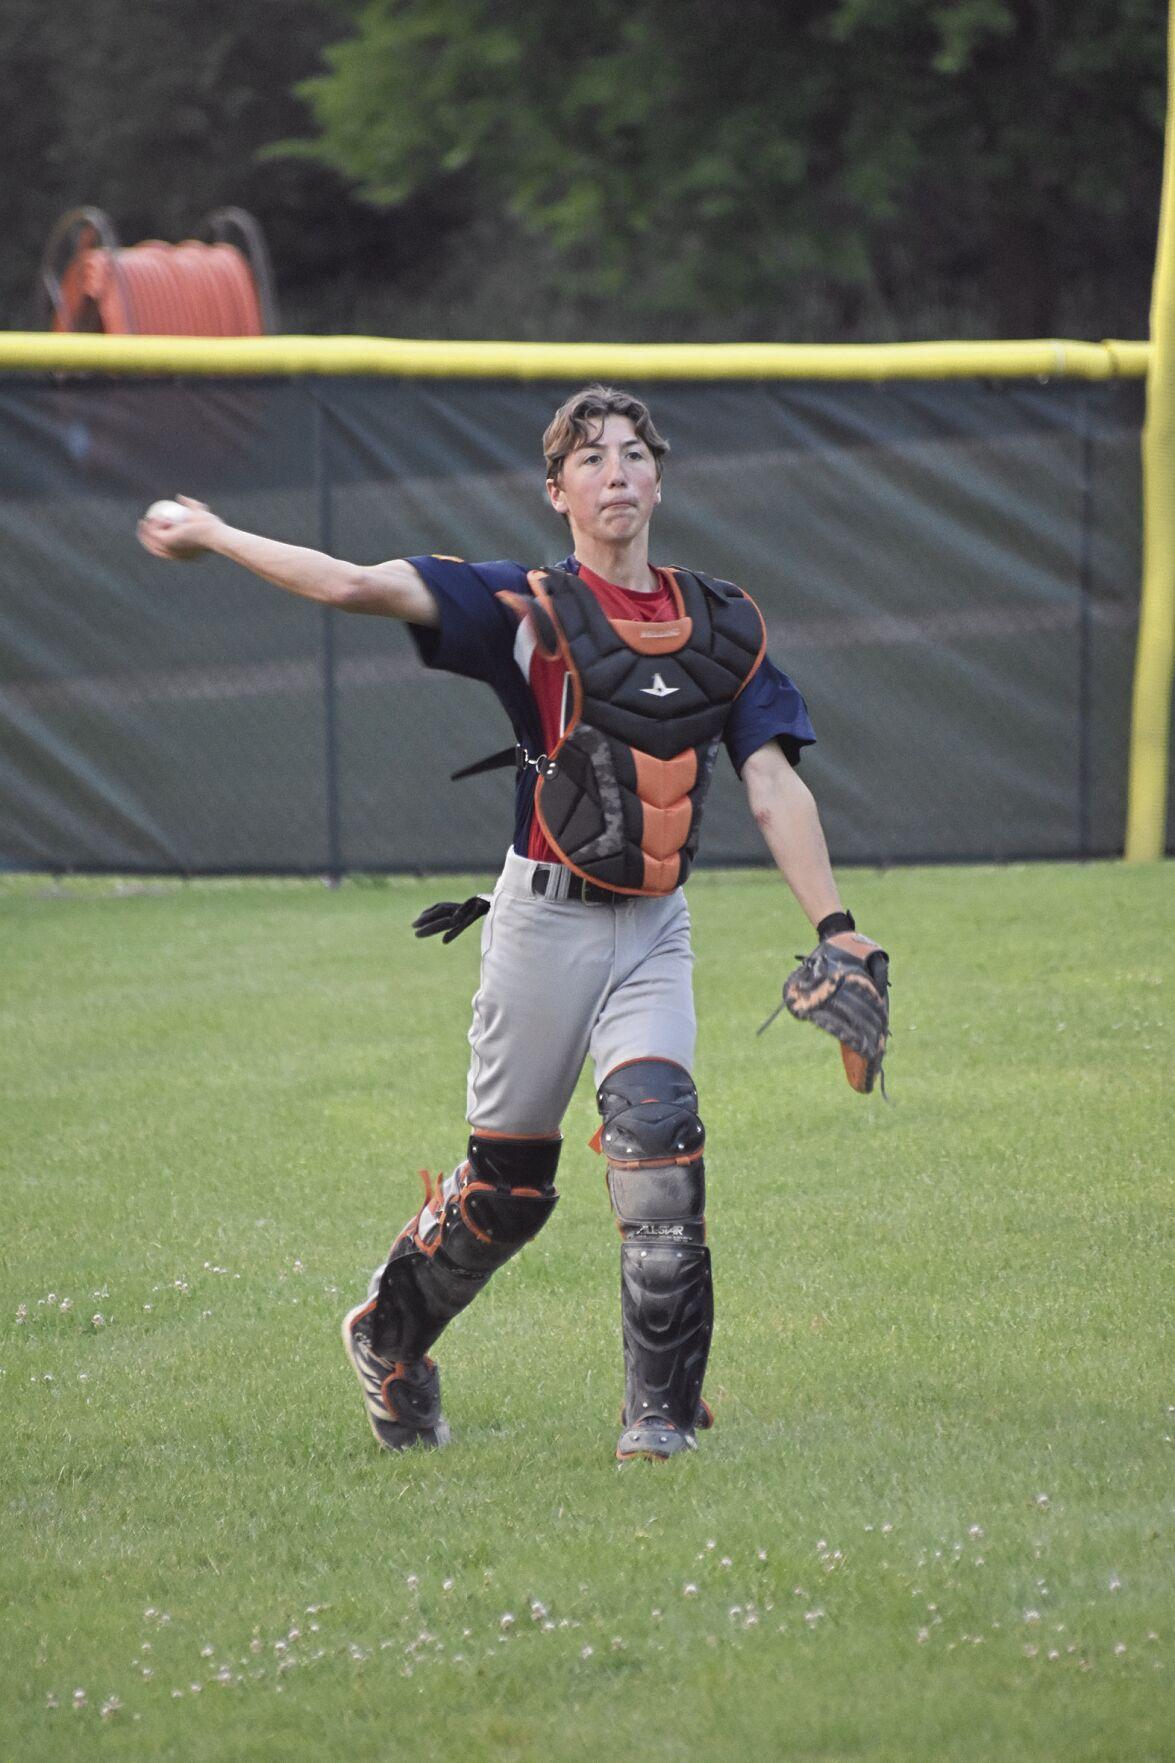 Ripon American Legion baseball at Green Lake —July 19, 2021 (Miya Grunert photos) (1).JPG